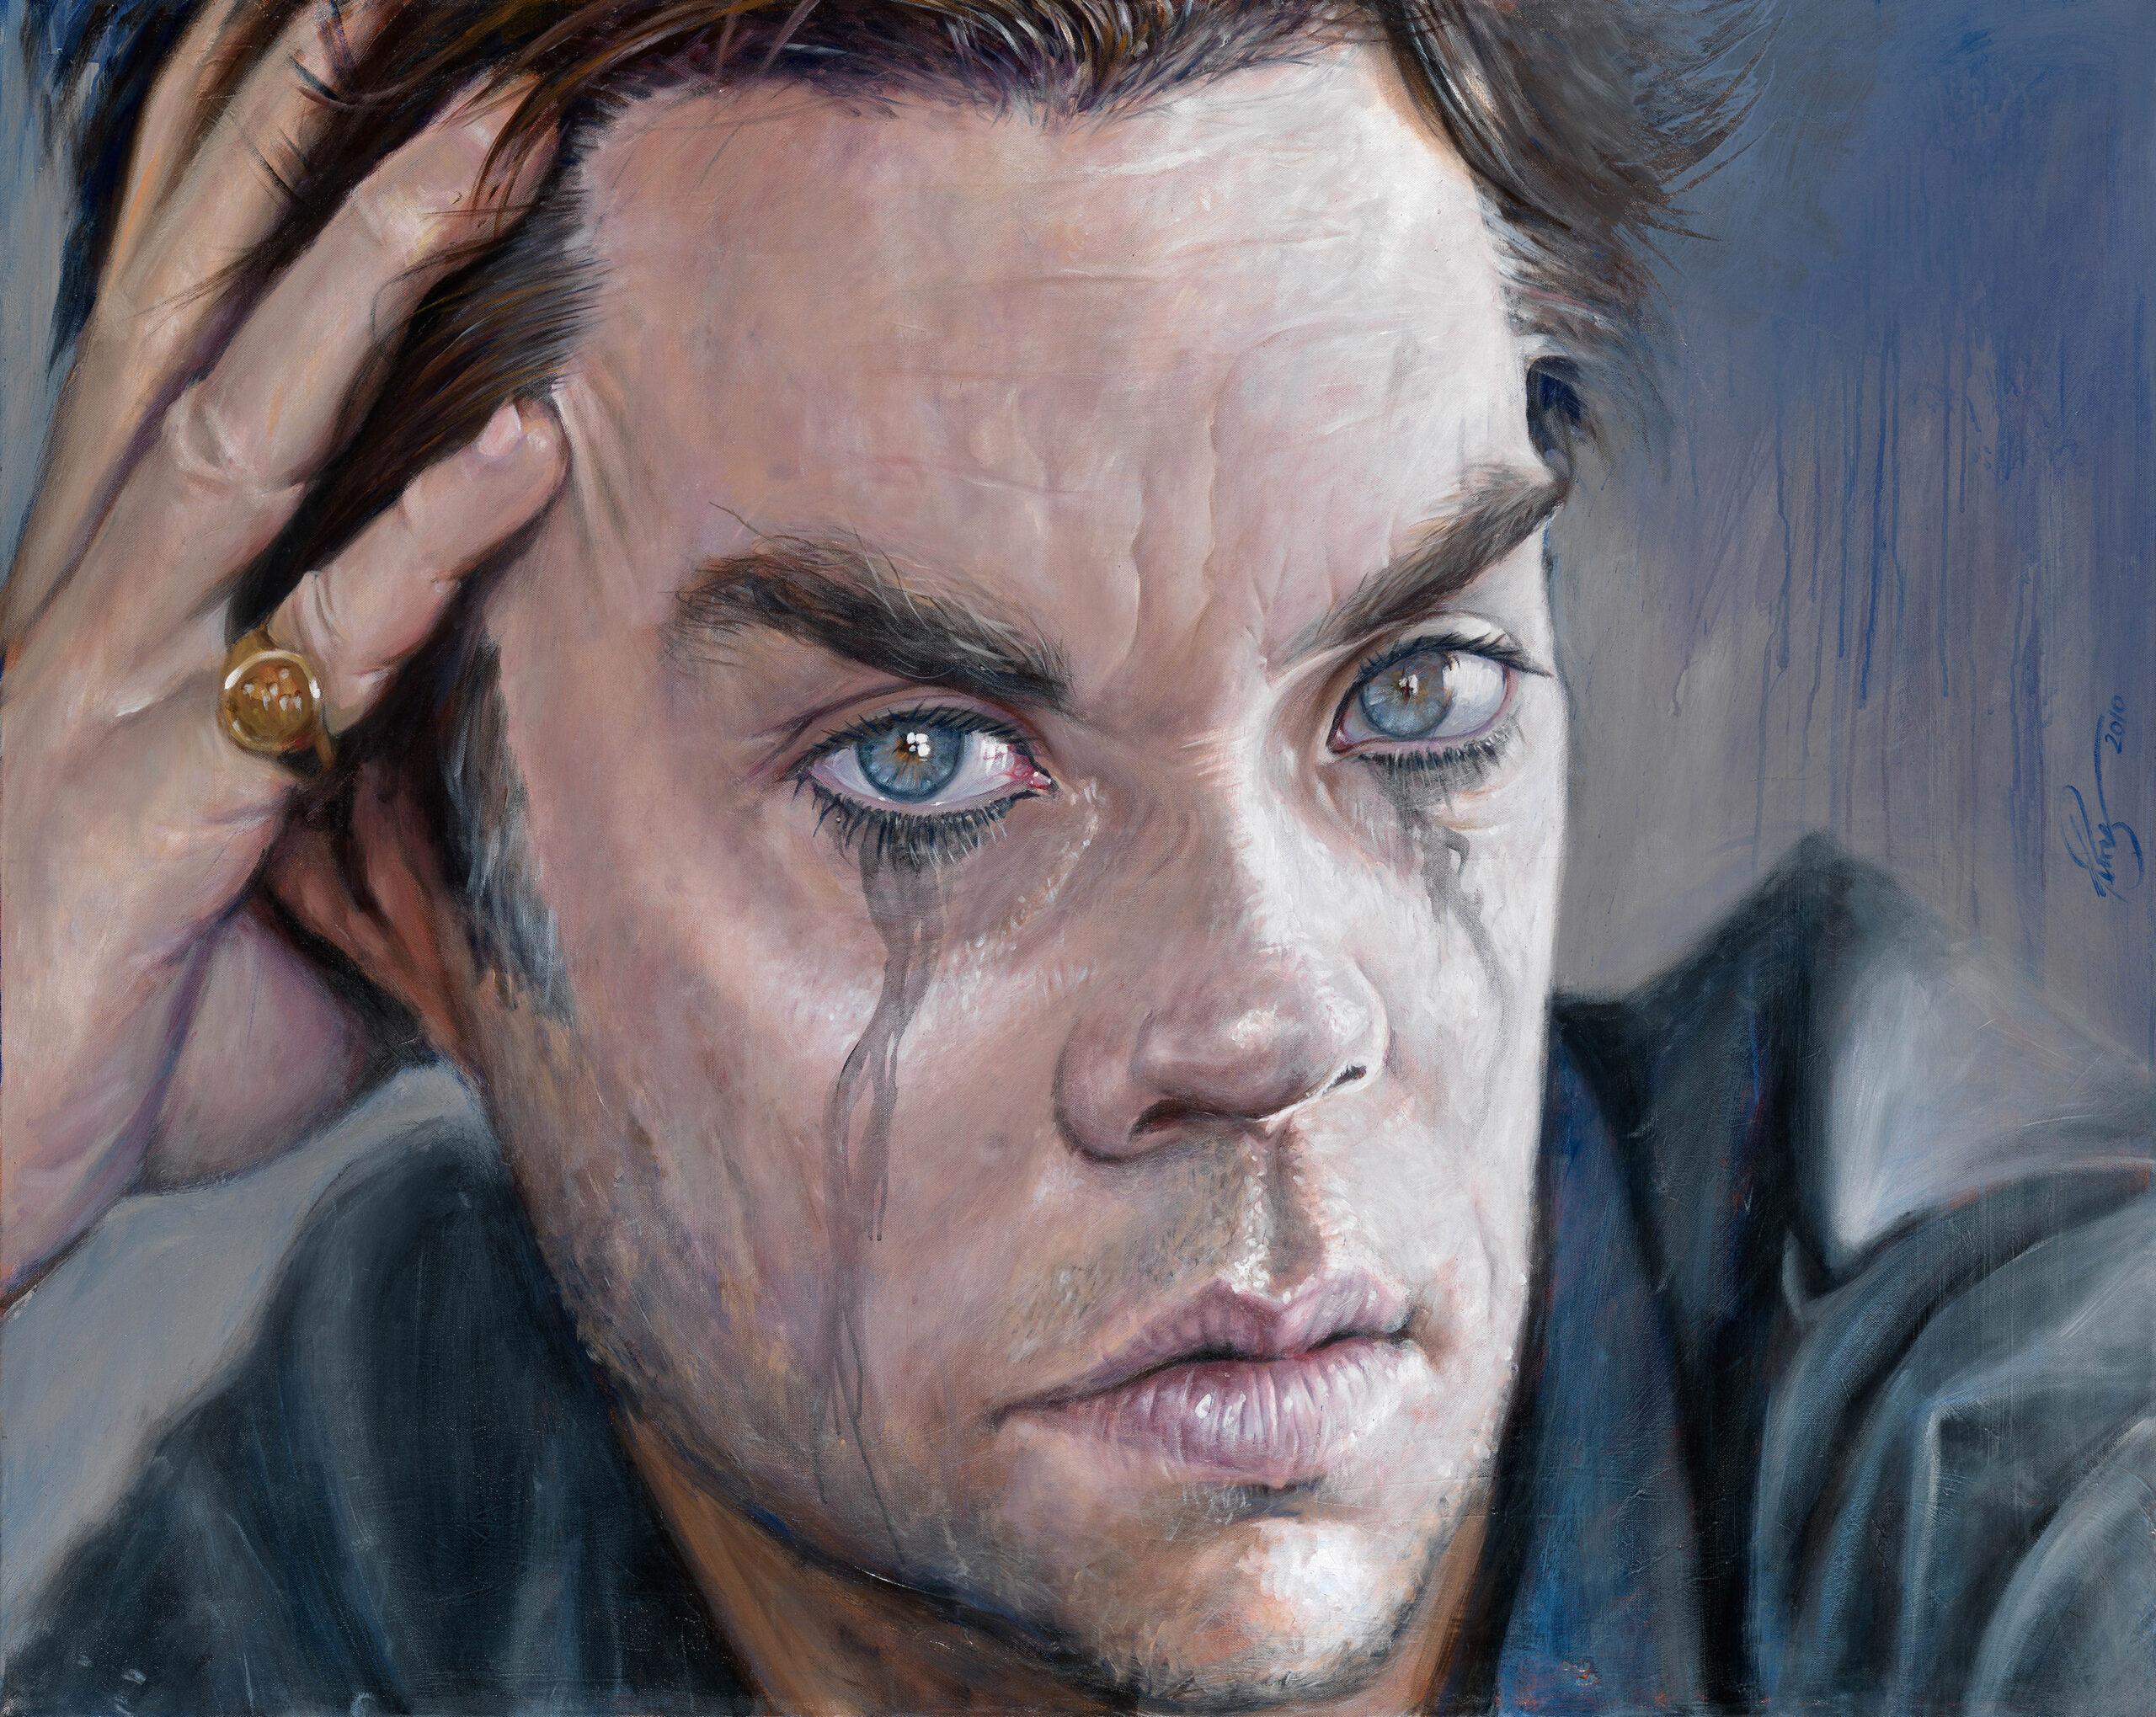 Rufus Wainwright portrait by Derren Brown